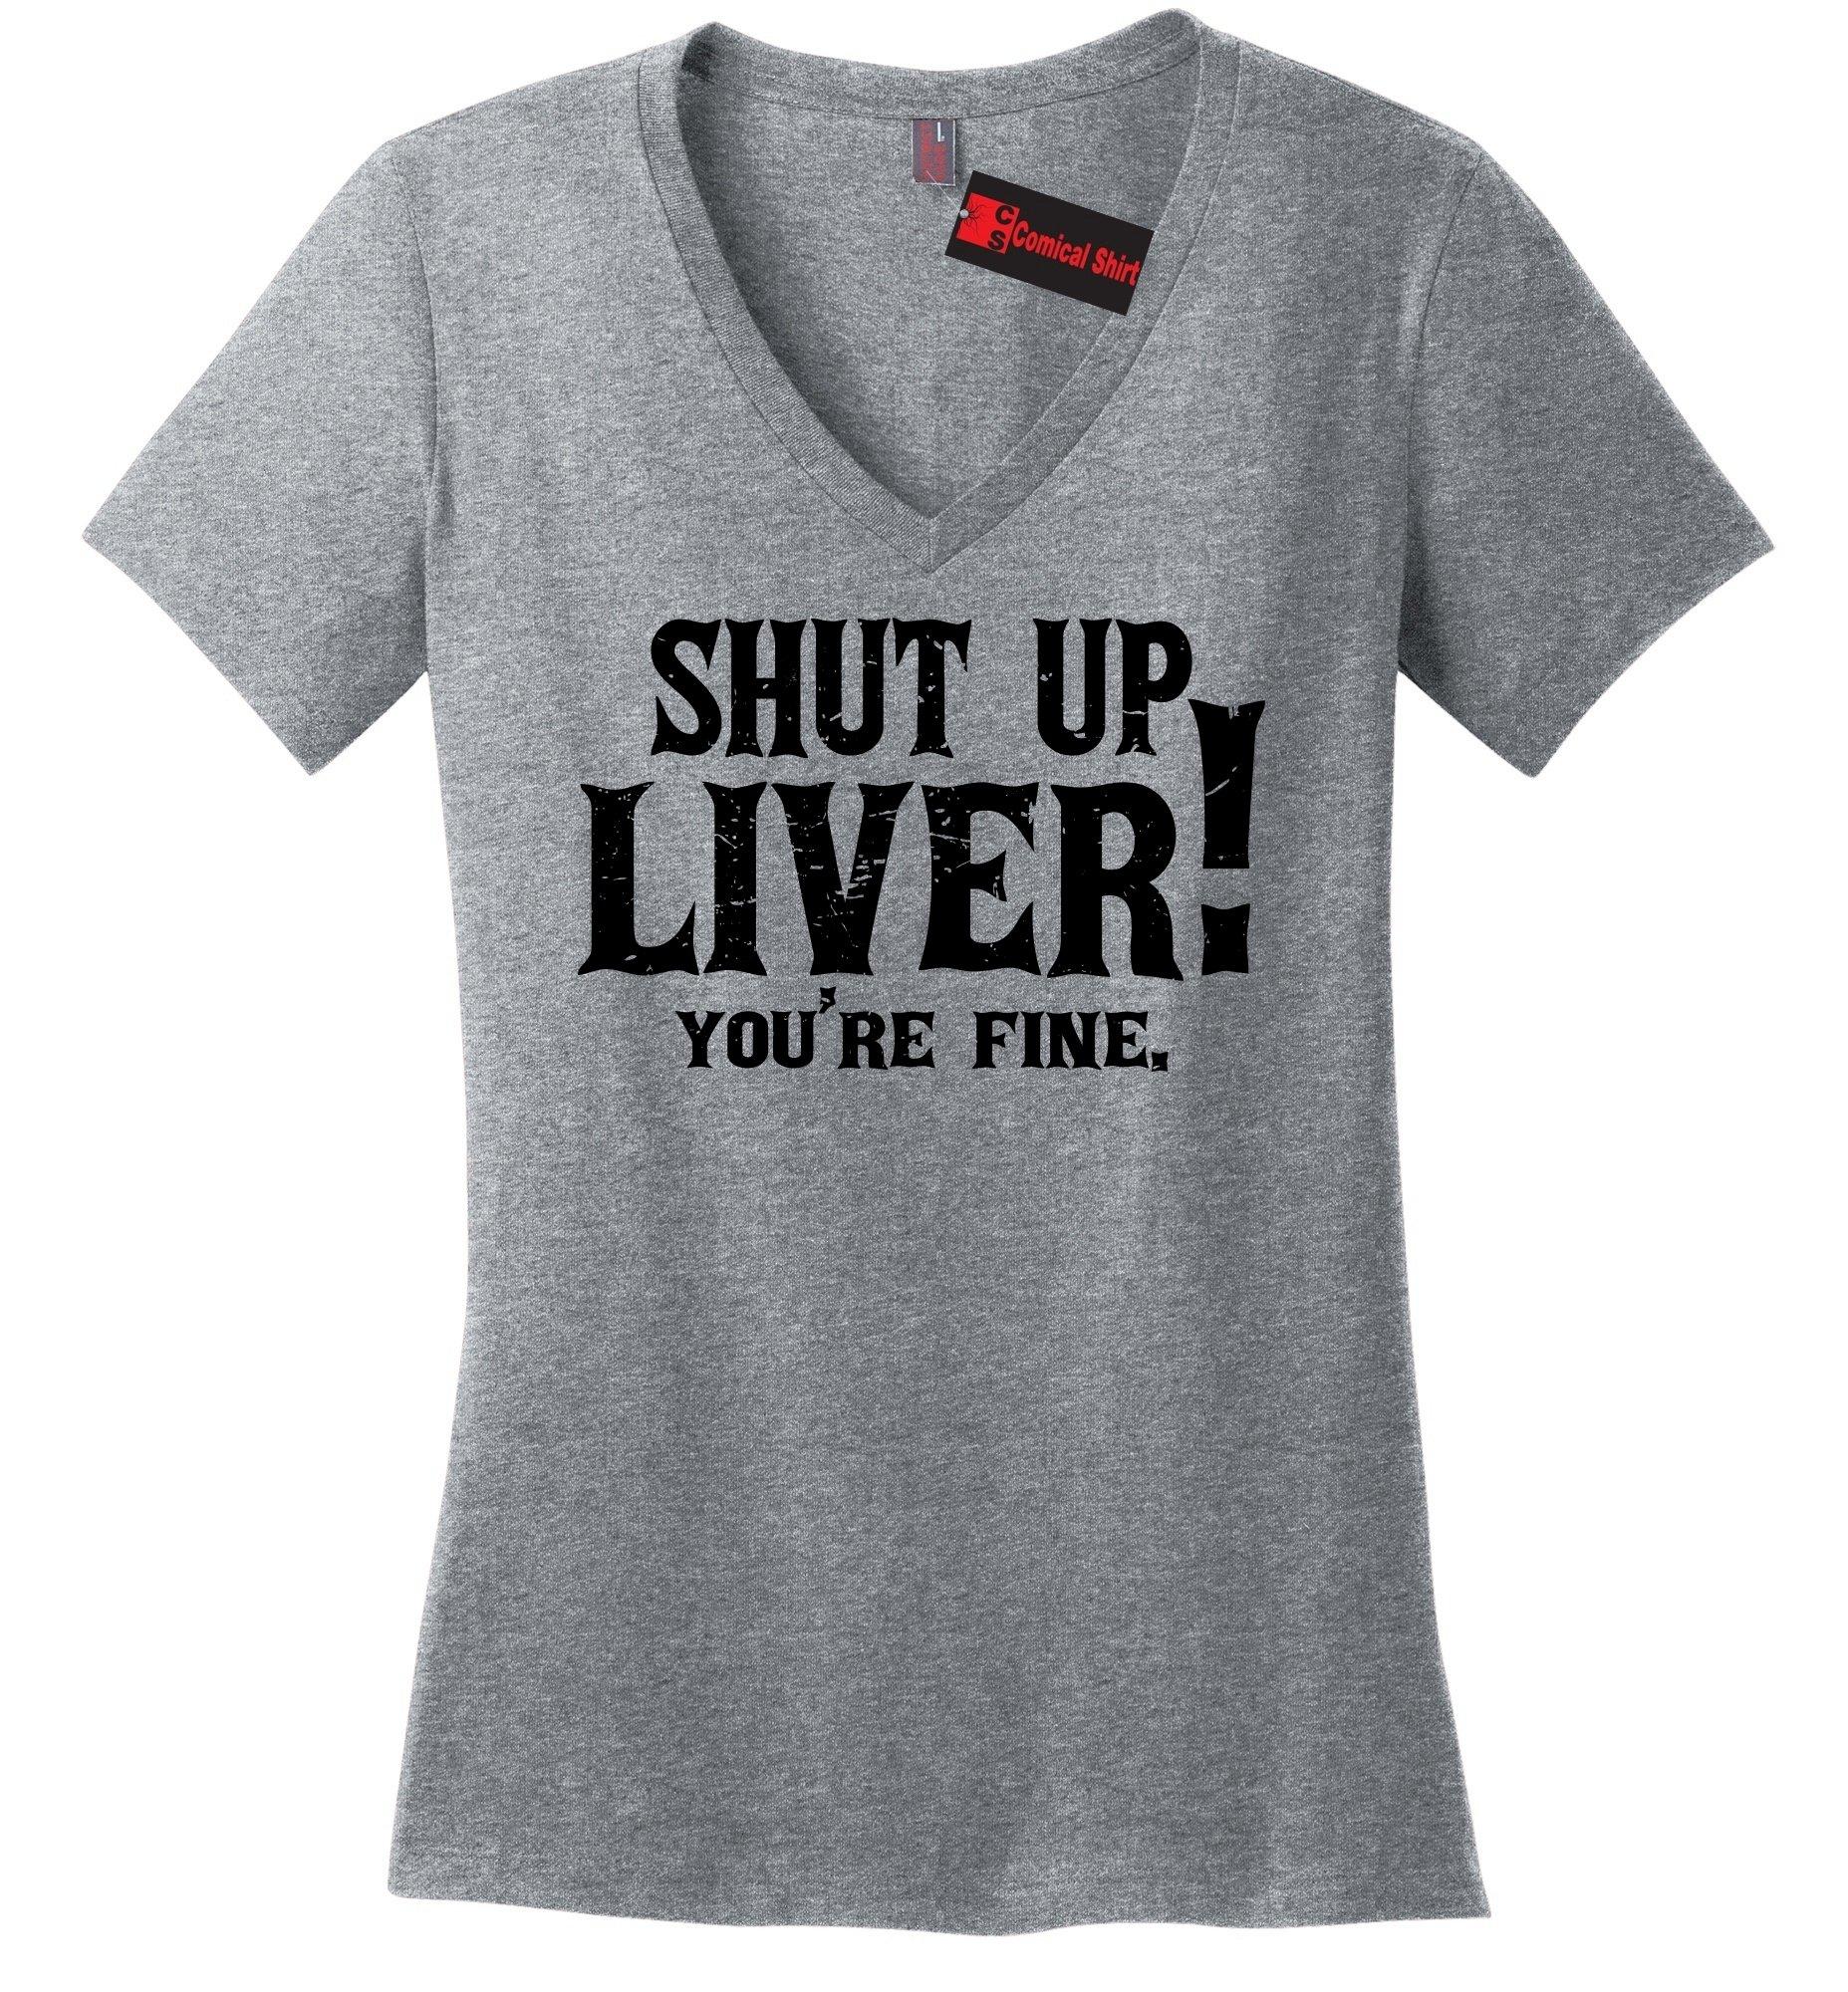 Comical Shirt Ladies Shut up Liver You're Fine Sport Grey M